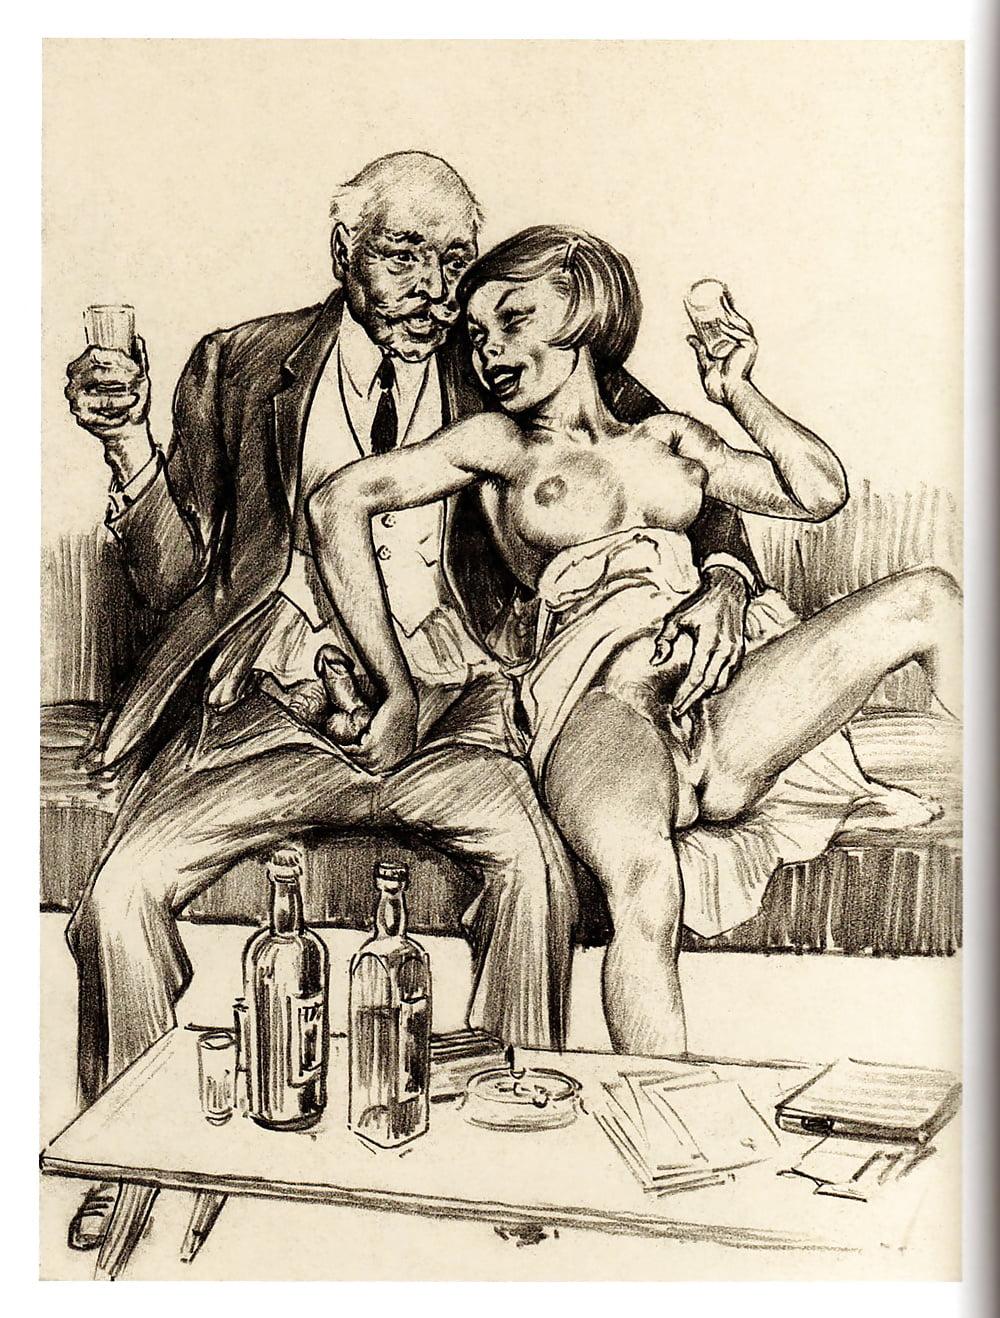 Ffm Mature Sex Drawings